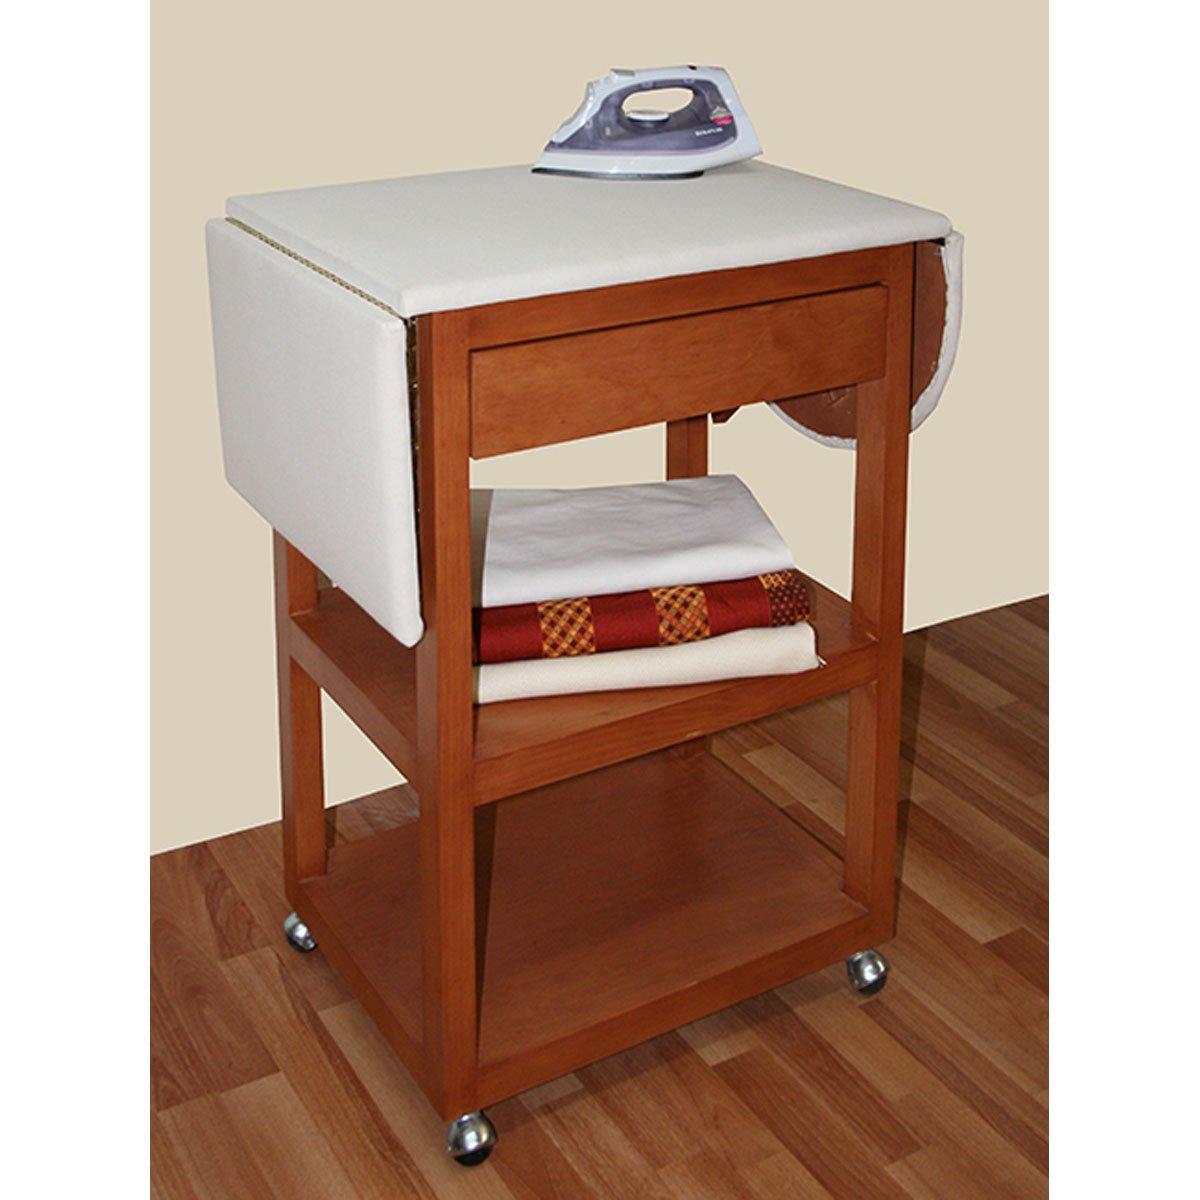 Mueble para tabla de planchar dise os arquitect nicos for Mueble para planchar ikea